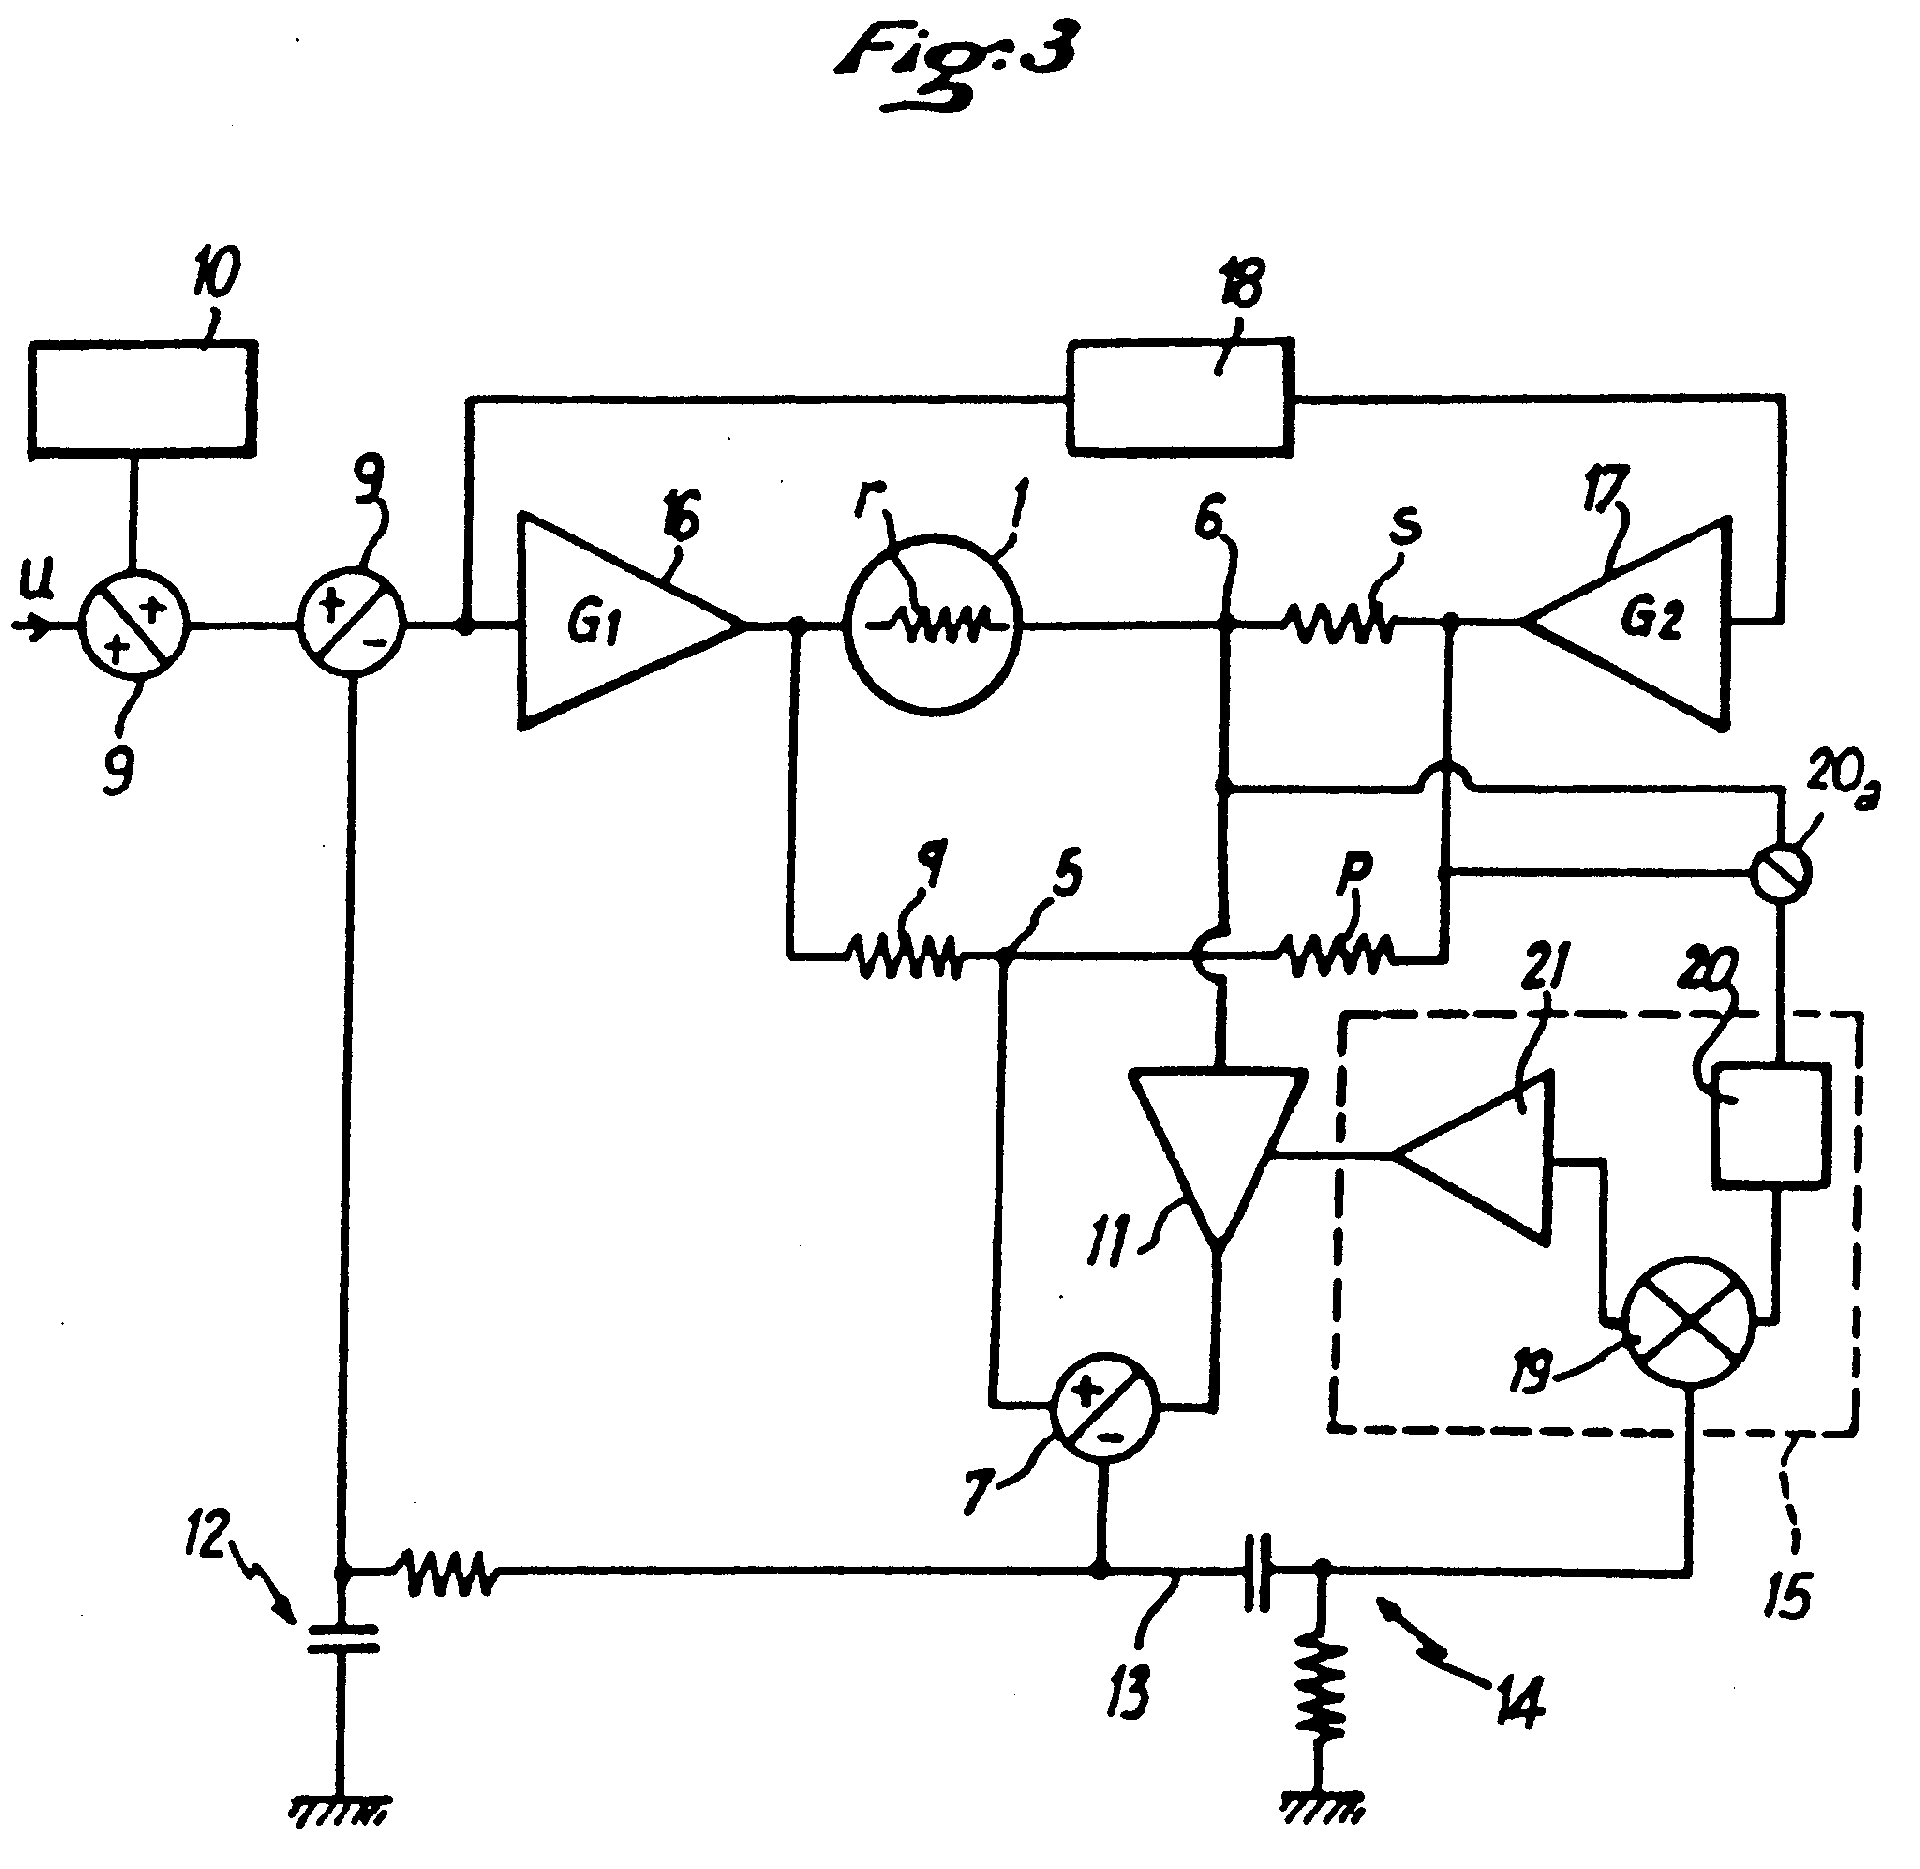 patent ep0380404b1